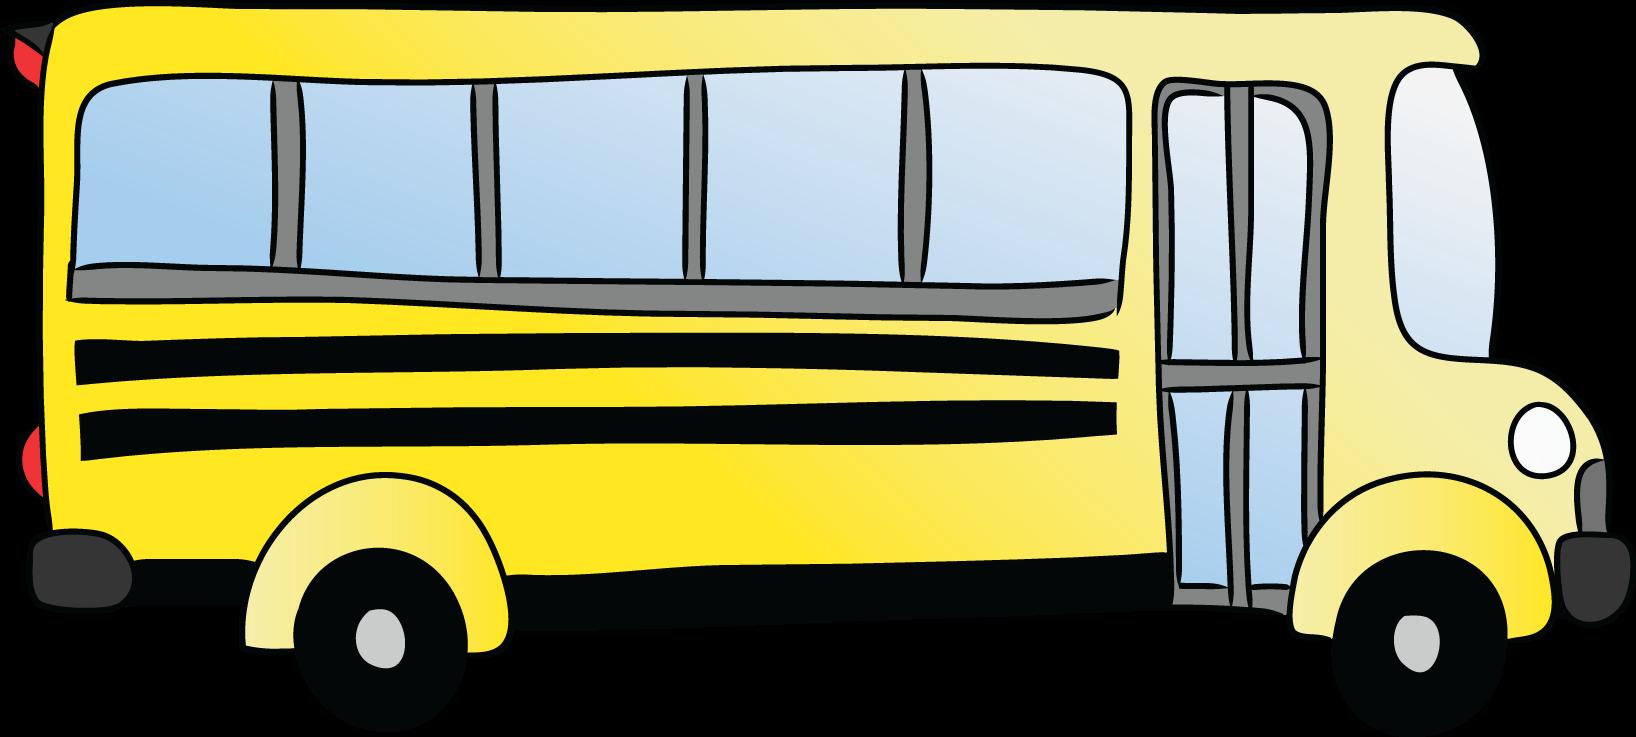 School bus clip art. Free school bus clipart